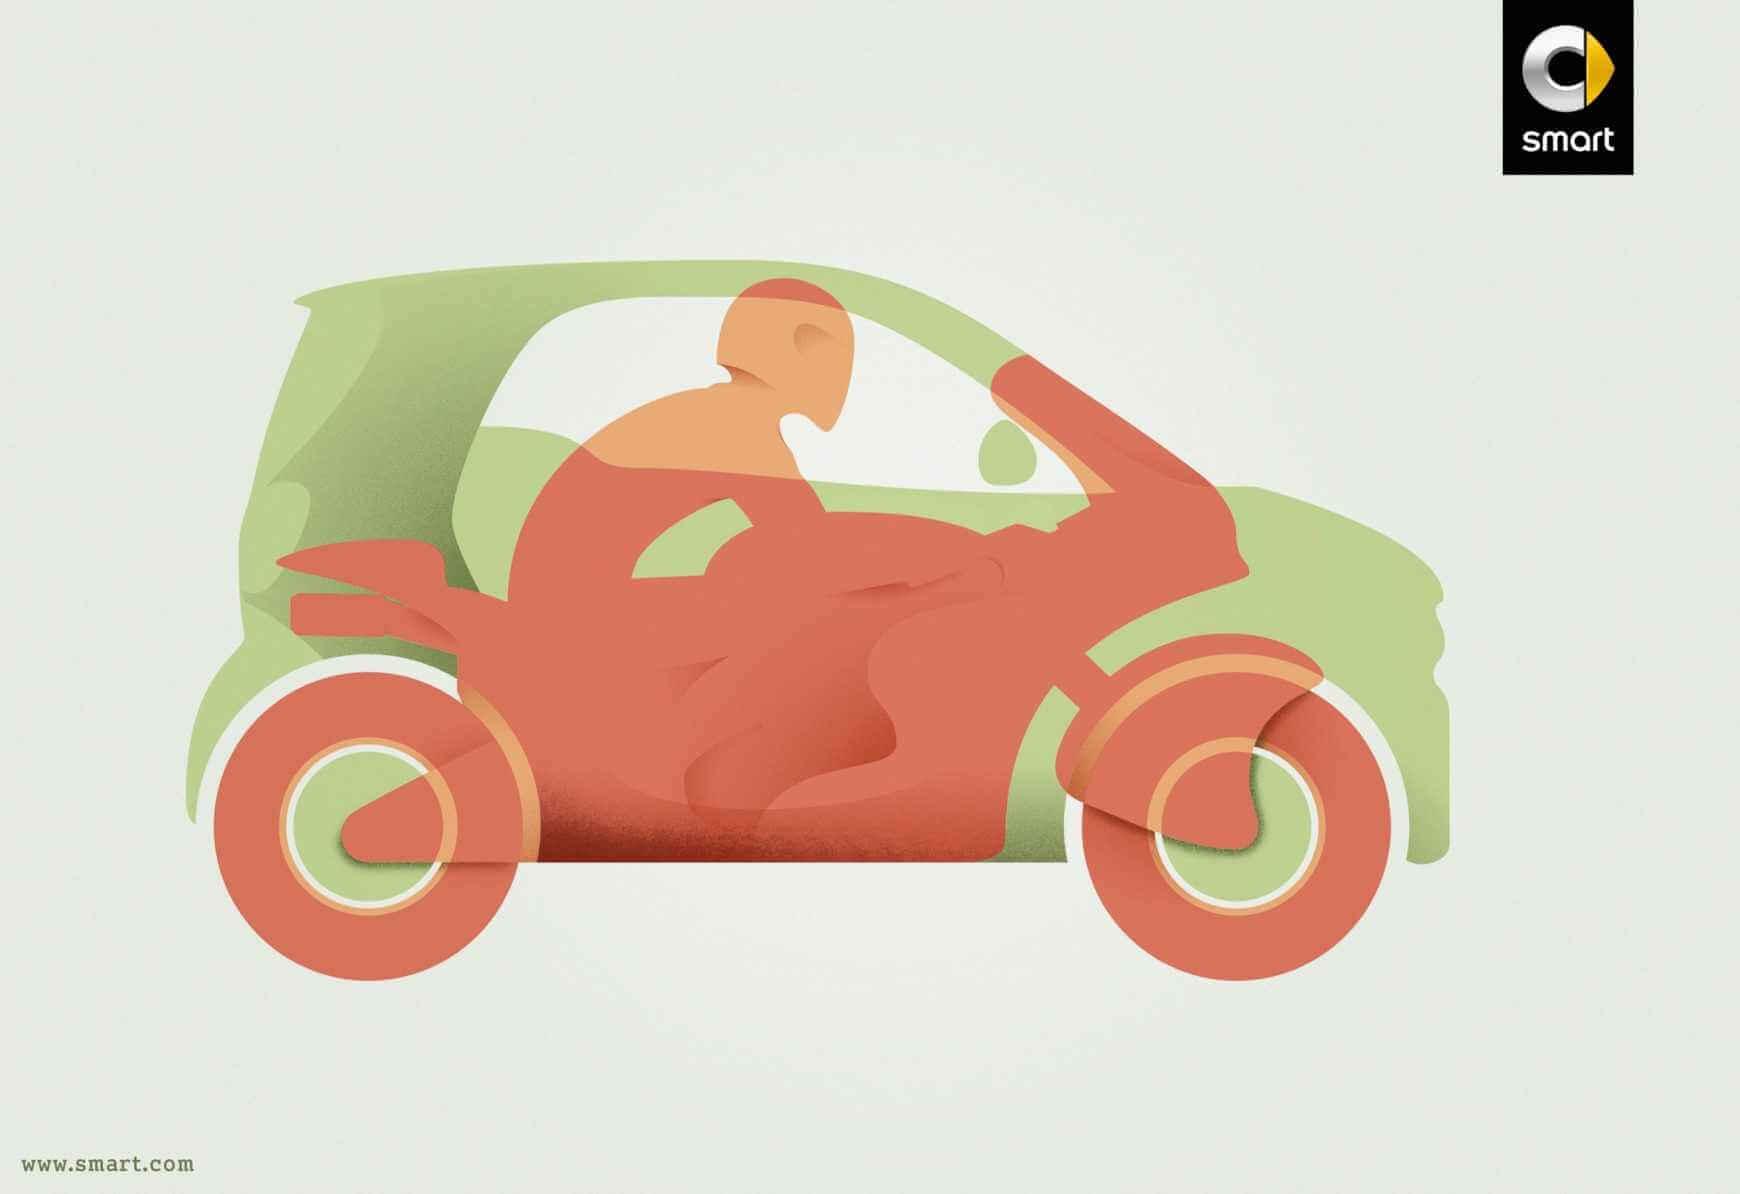 smart: Compacto motorizado.